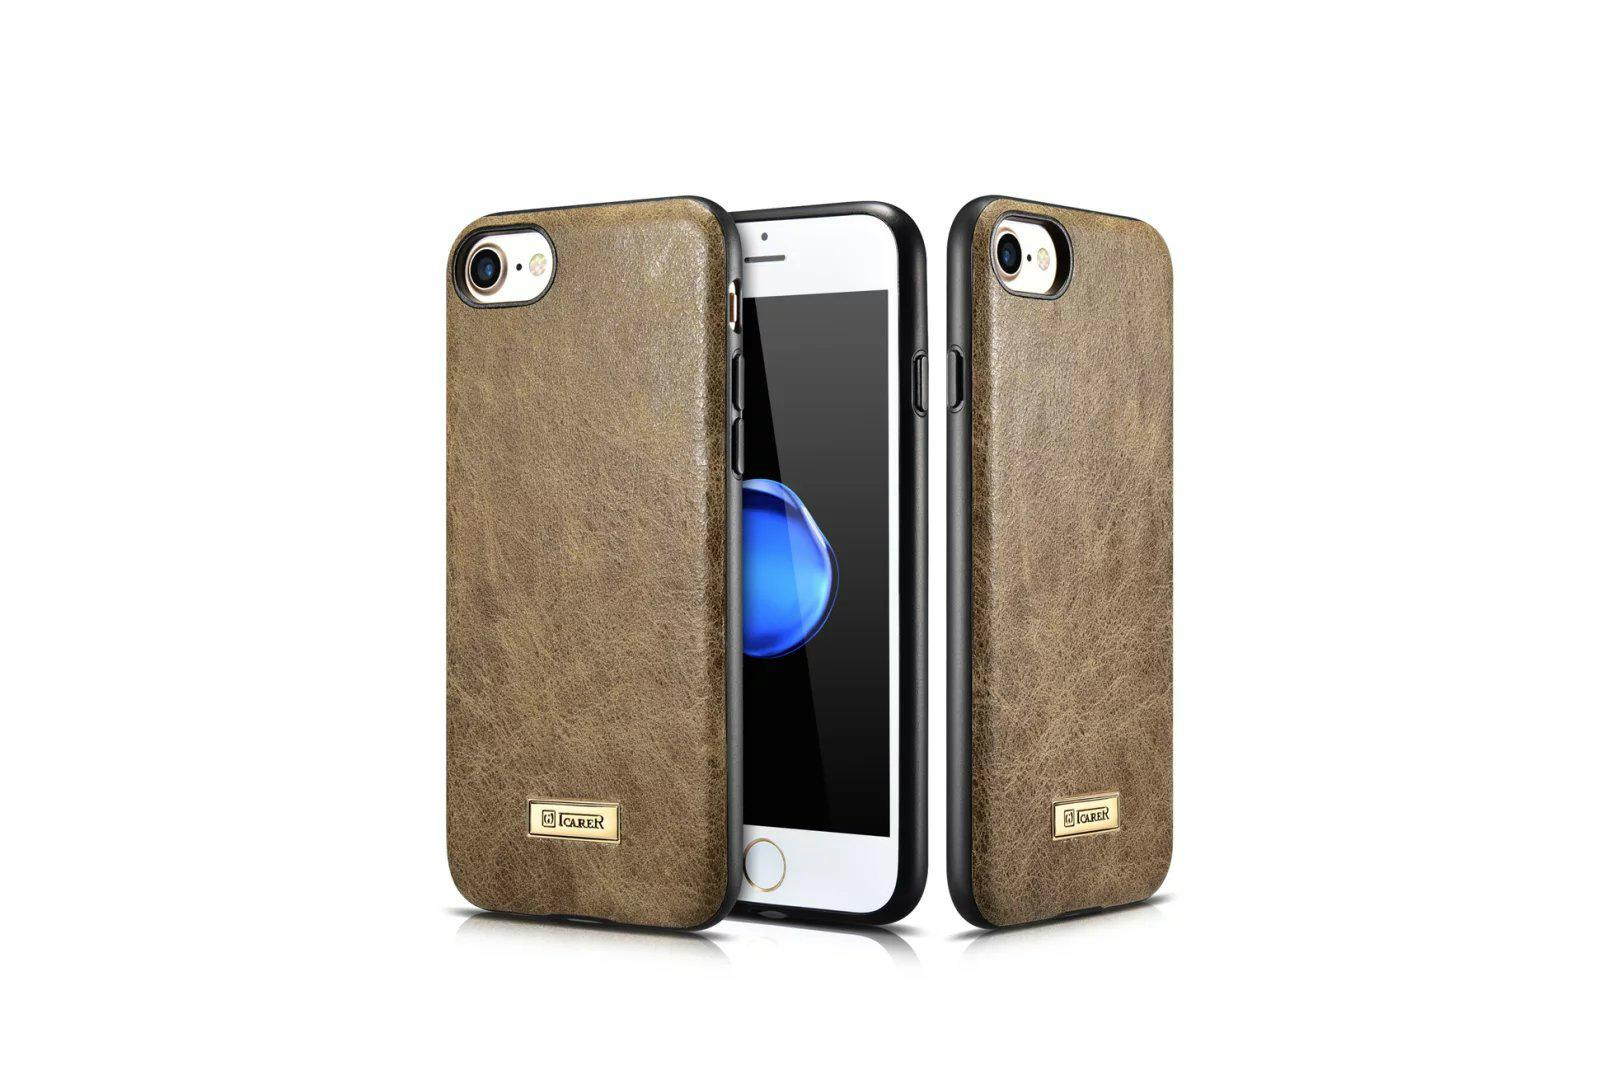 iCarer iPhone 7 Shenzhou Genuine Leather Fashional Back Cover Case 8